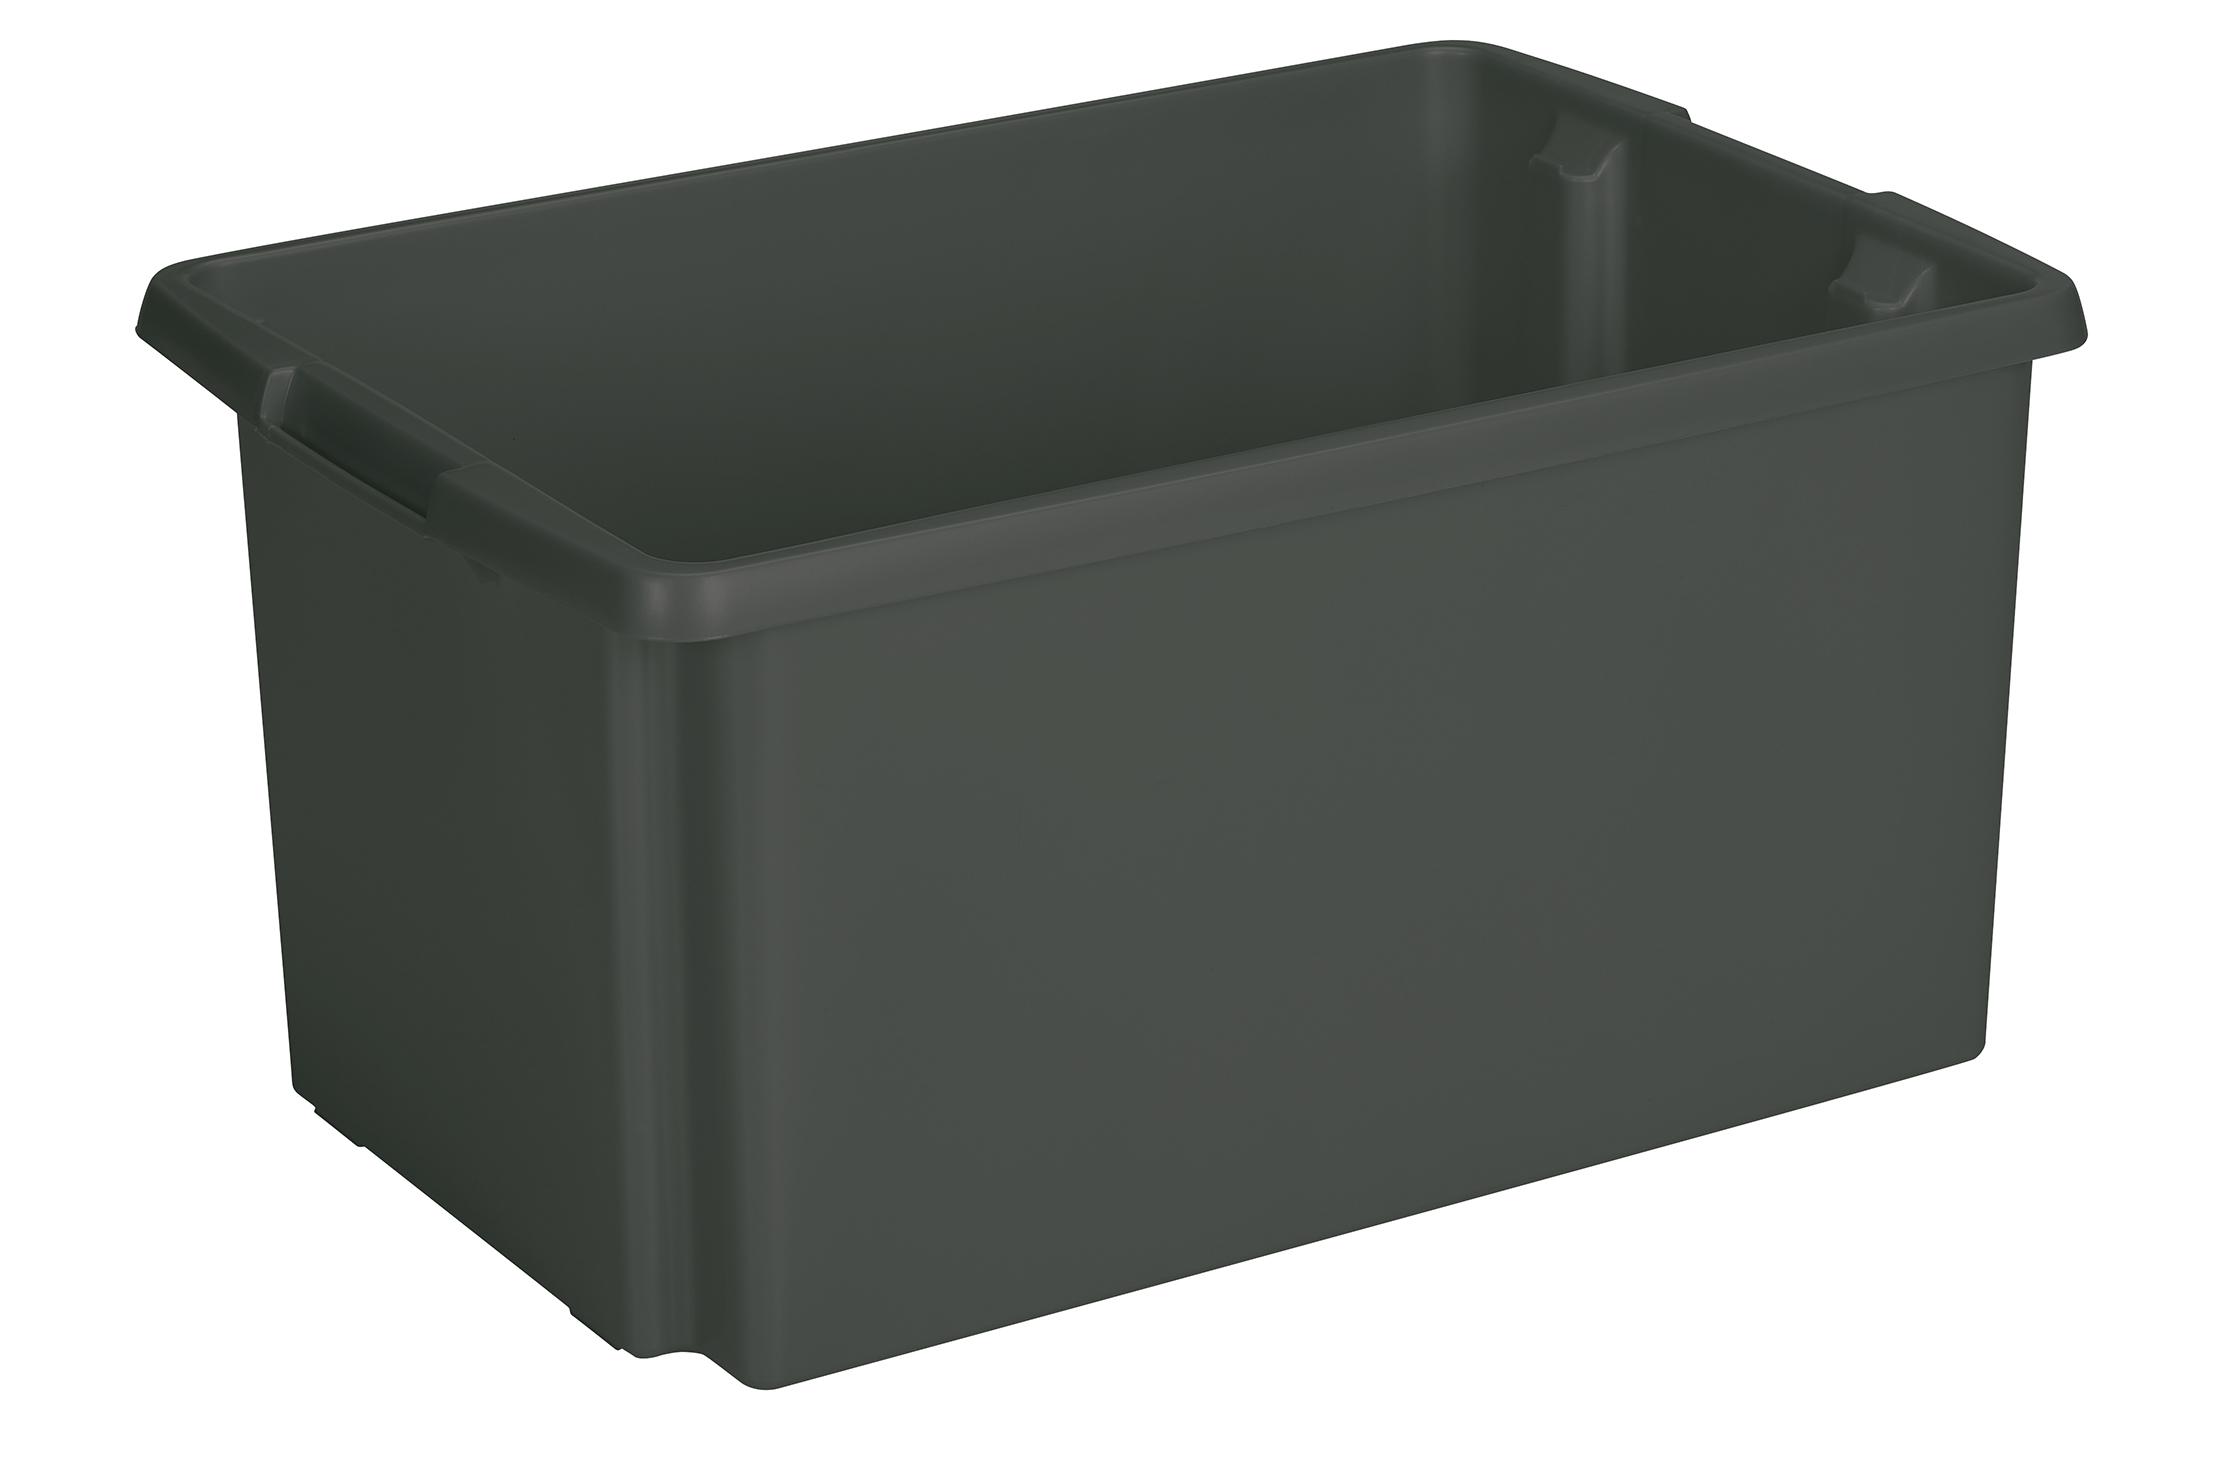 Sunware Relife Nesta Box 51l